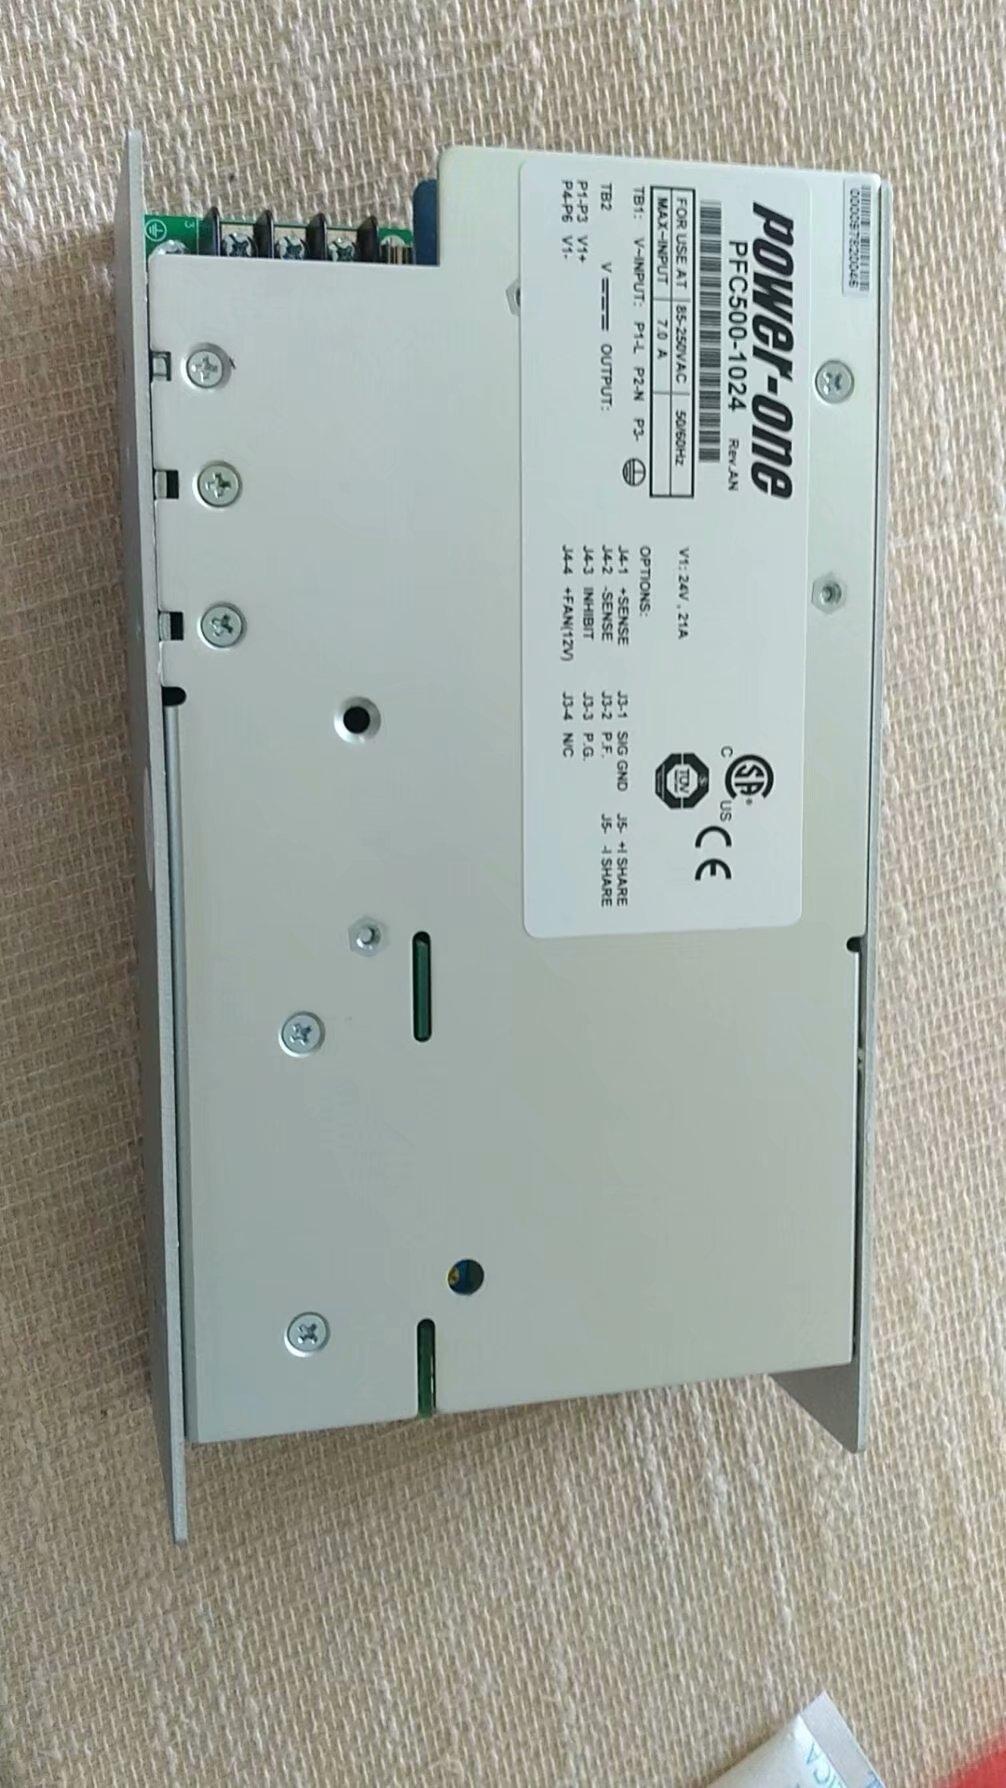 POWER-ONE可并联或冗余电源PFC500-1024G